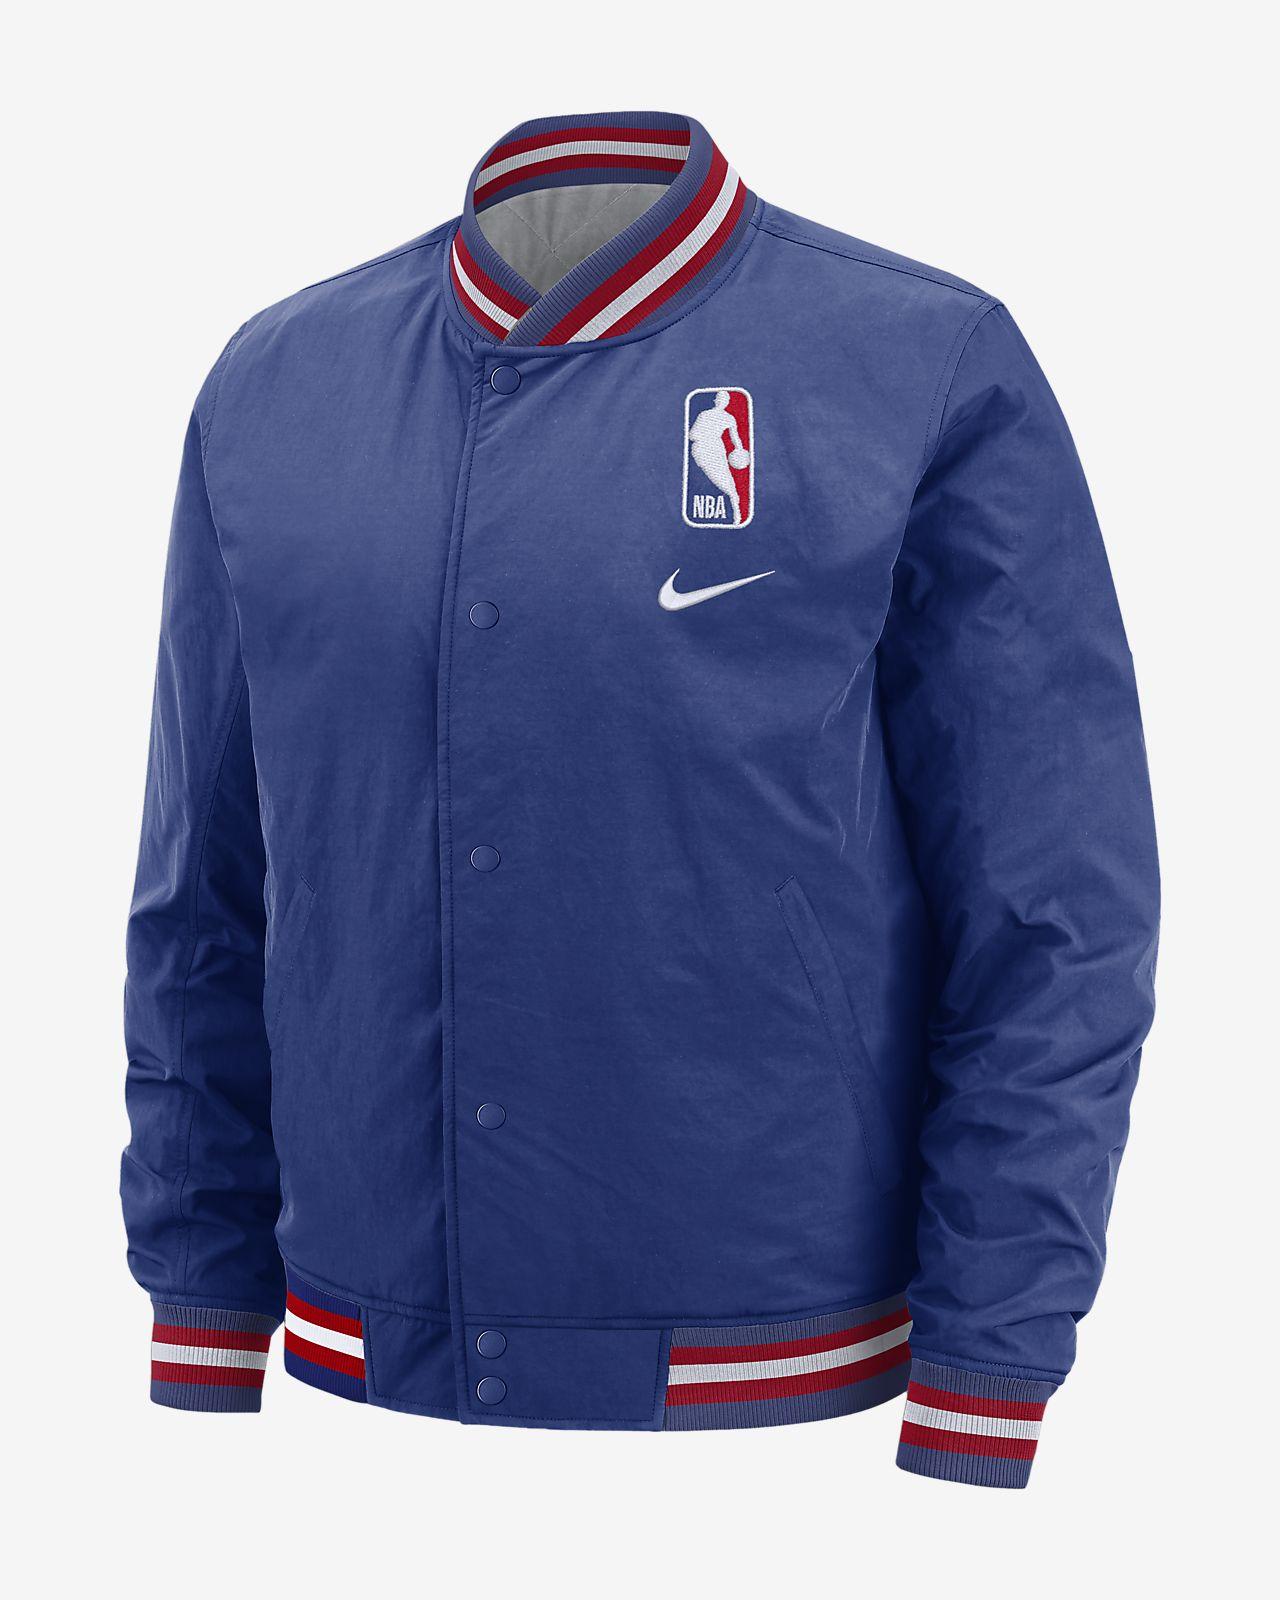 Nike Men's NBA Jacket